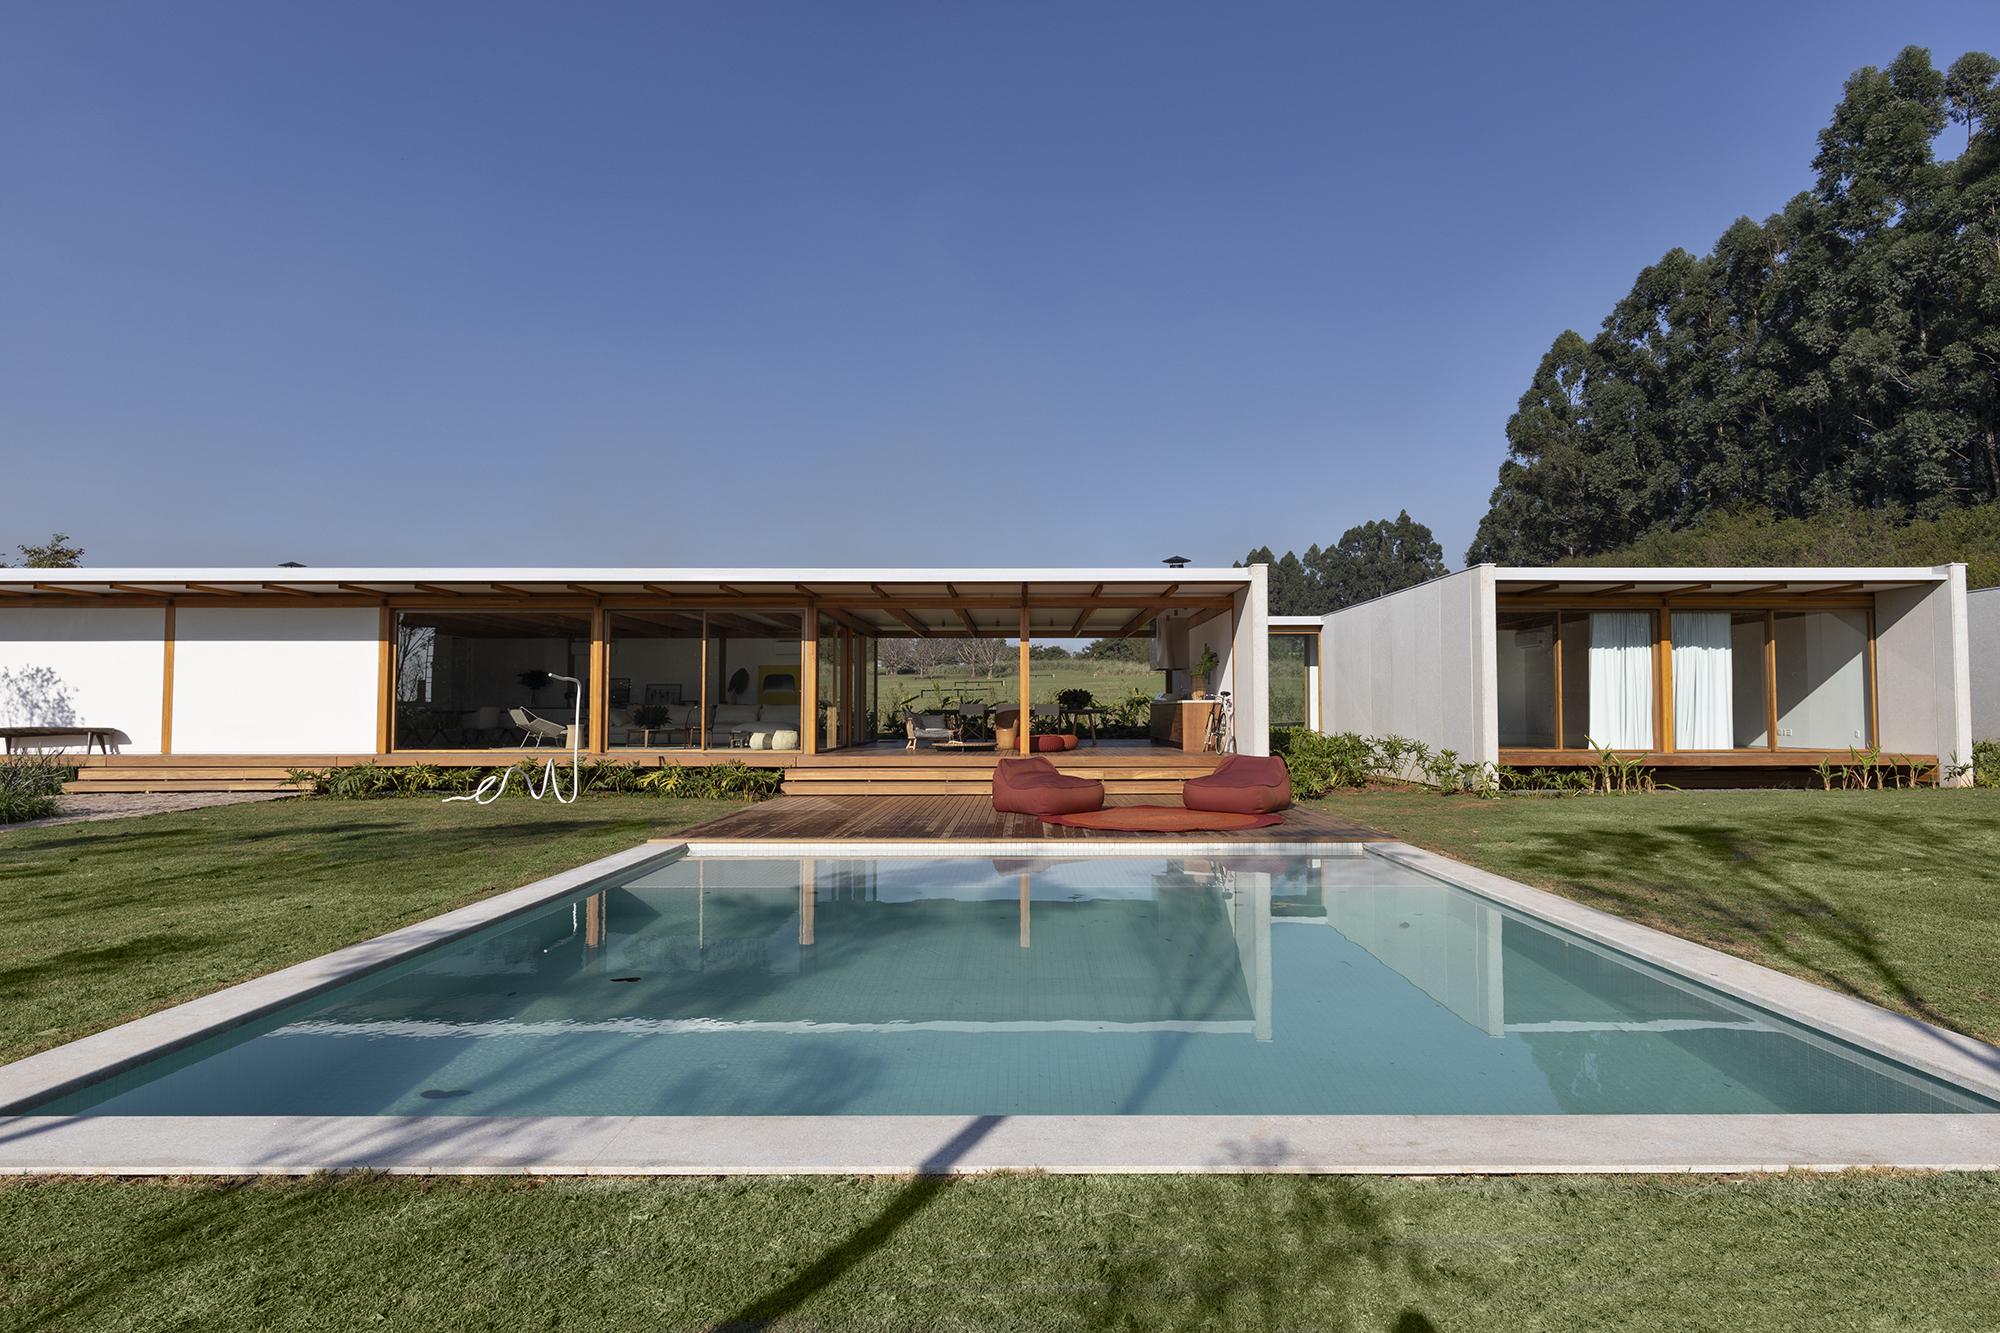 Ruy Texeira|Bernardes Arquitetura